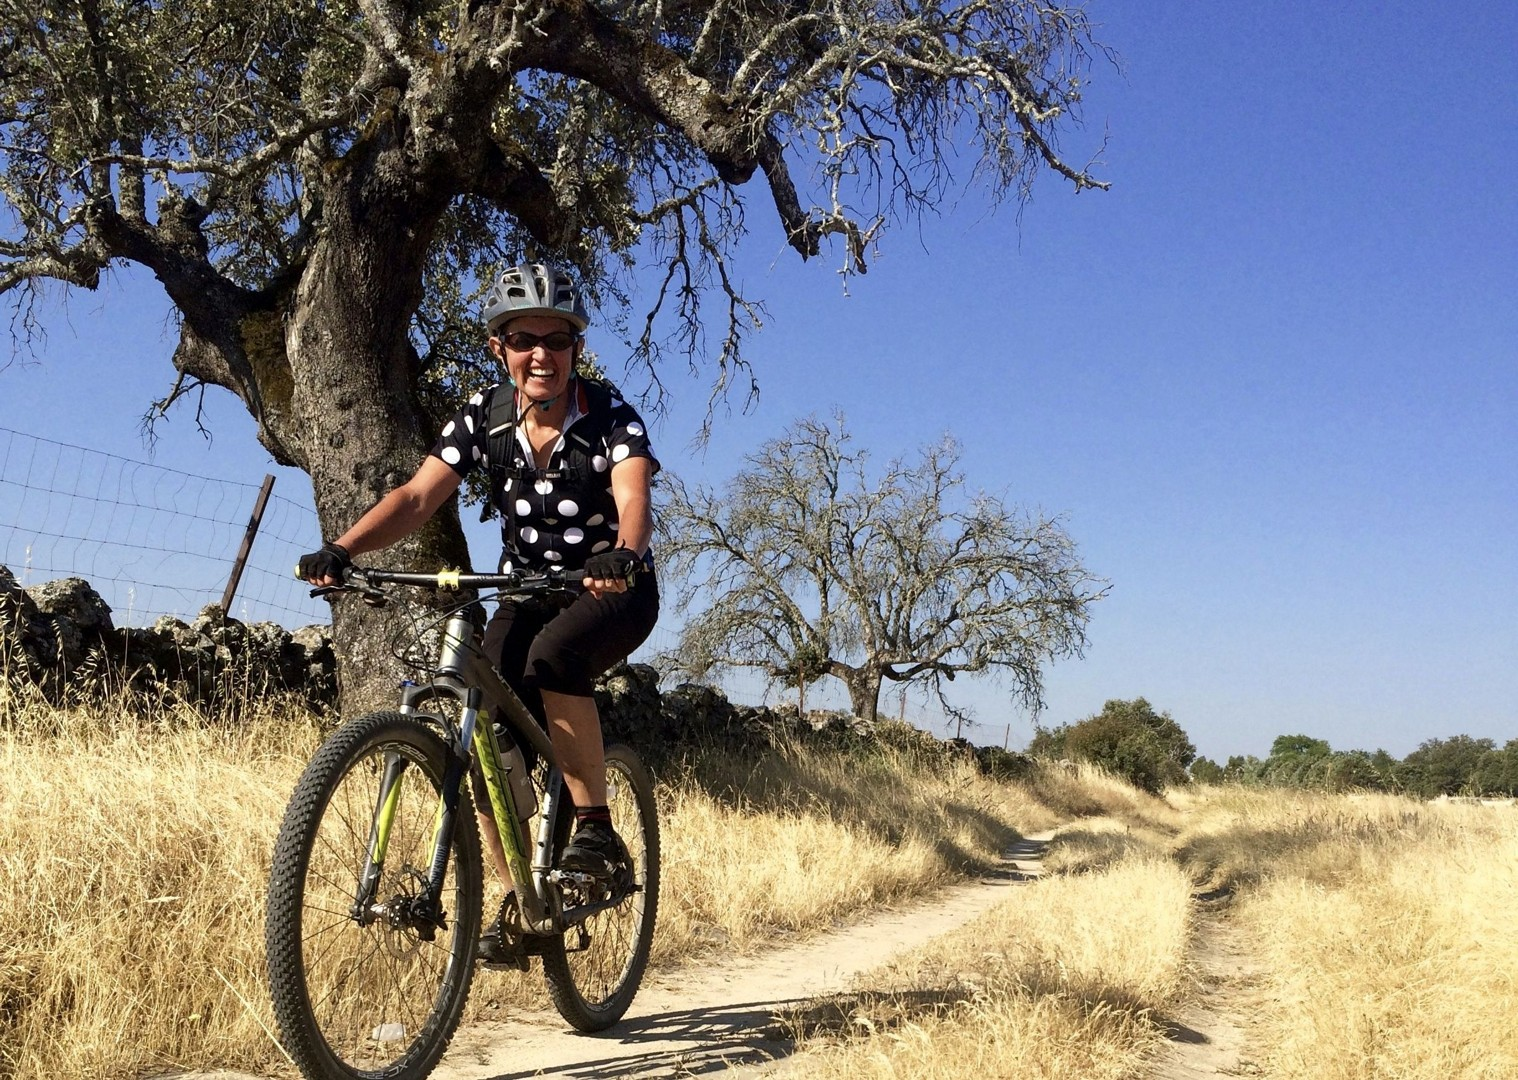 rutaplata3.jpg - Spain - Ruta de la Plata - Guided Mountain Bike Holiday - Mountain Biking